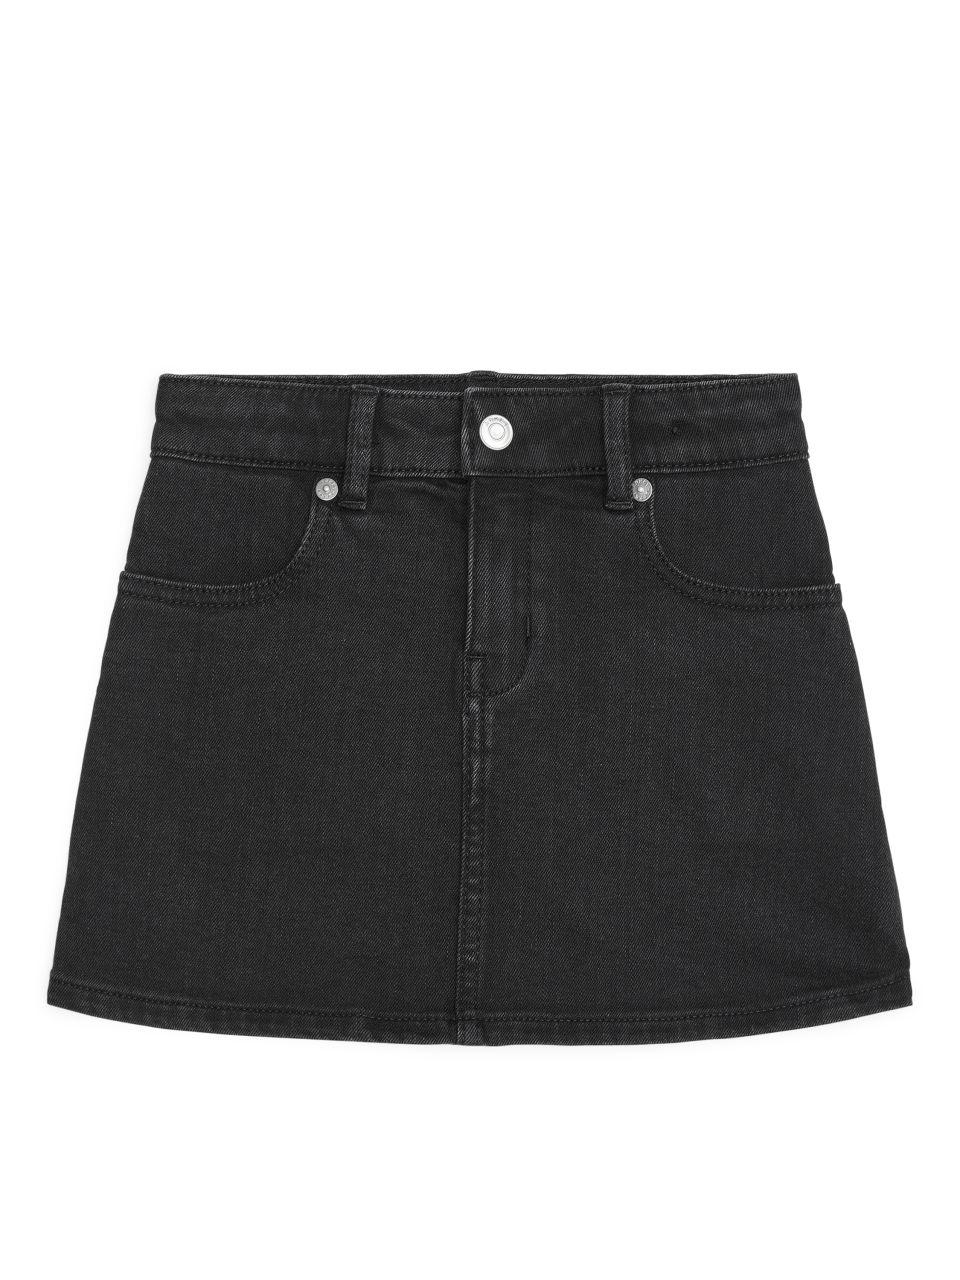 Stretch Twill Skirt - Black